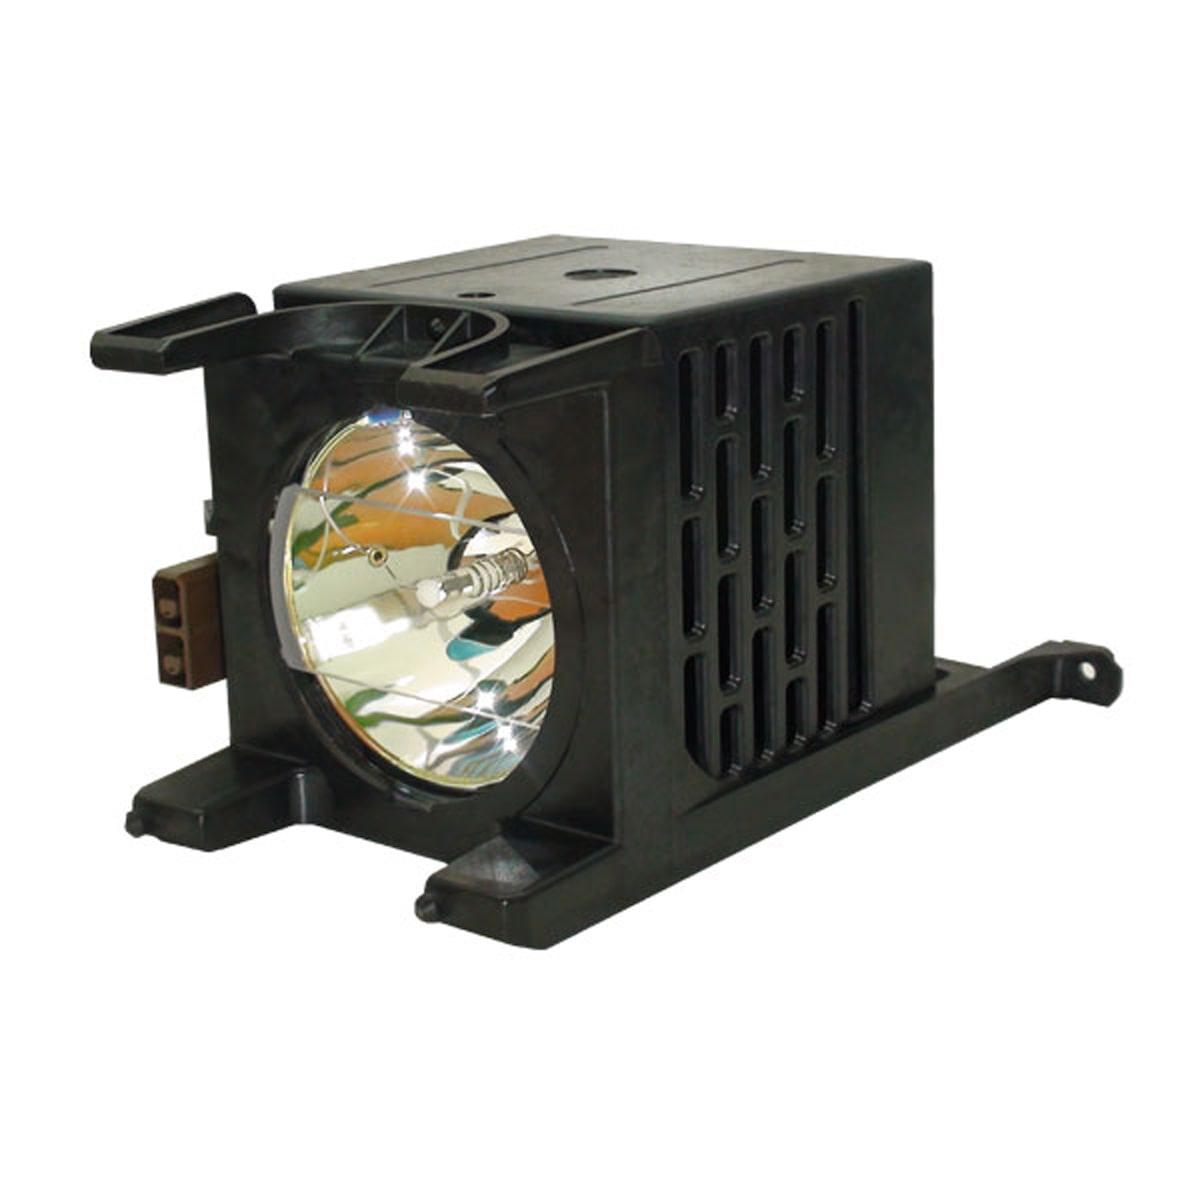 75007110A Phoenix Bare TV Lamp Original DLP LCD Toshiba Y66-LMP